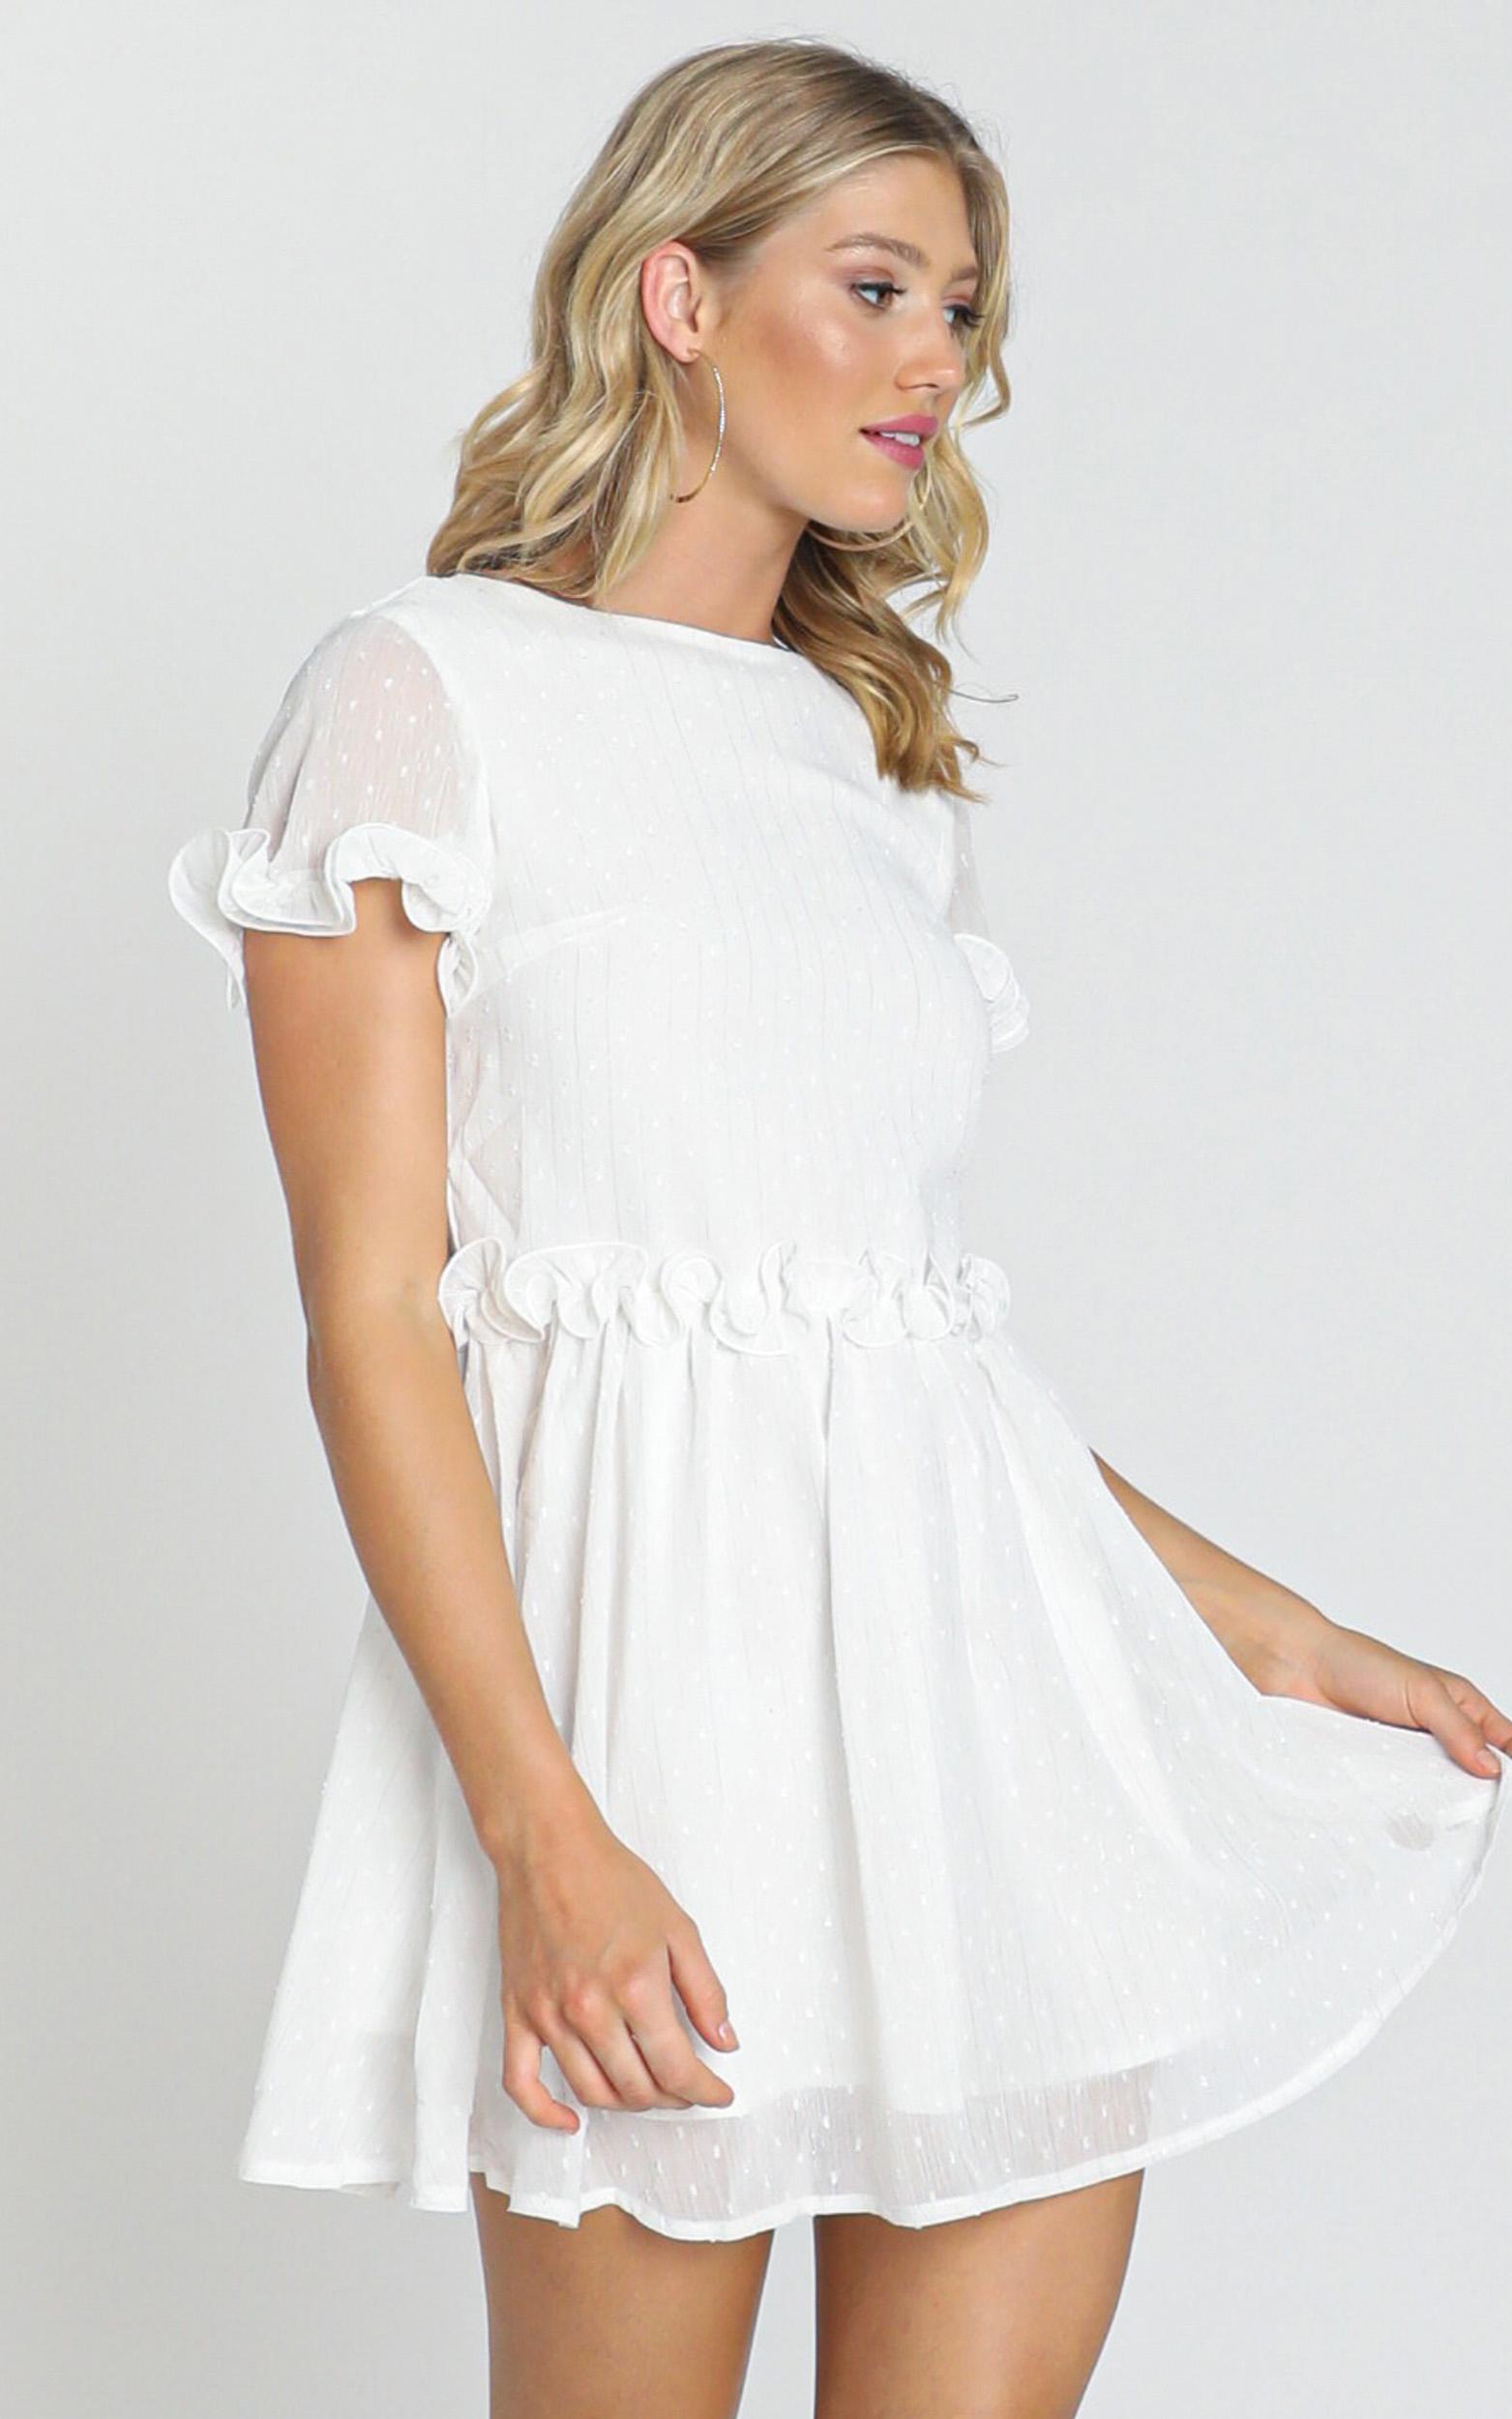 Larsa Textured Dobby Dress in white - 6 (XS), White, hi-res image number null